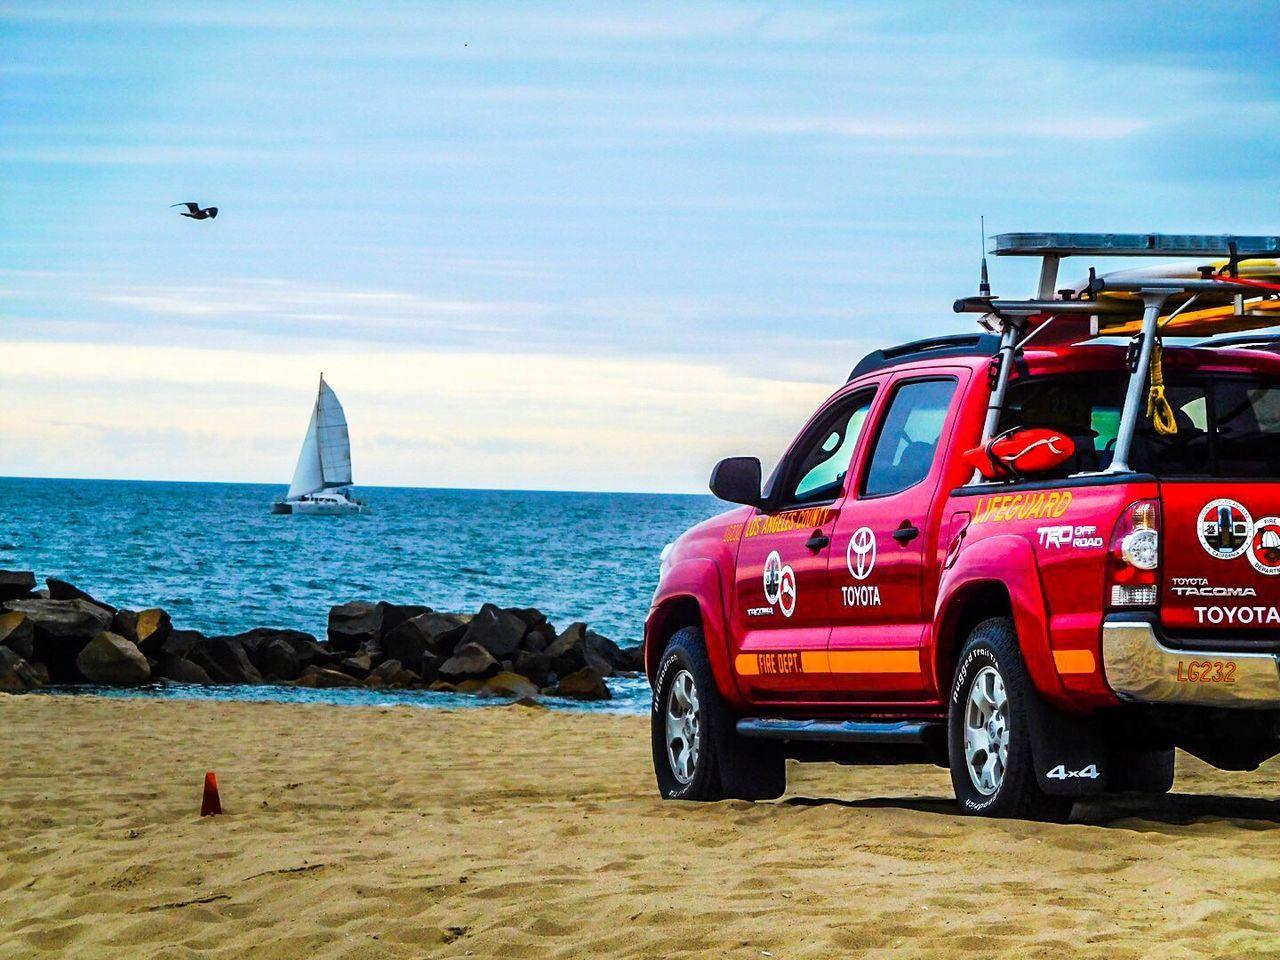 Venice Beach Lafd Firedepartment LAFIRE Beach Photography Beach View Beachpatrol Lifeguard